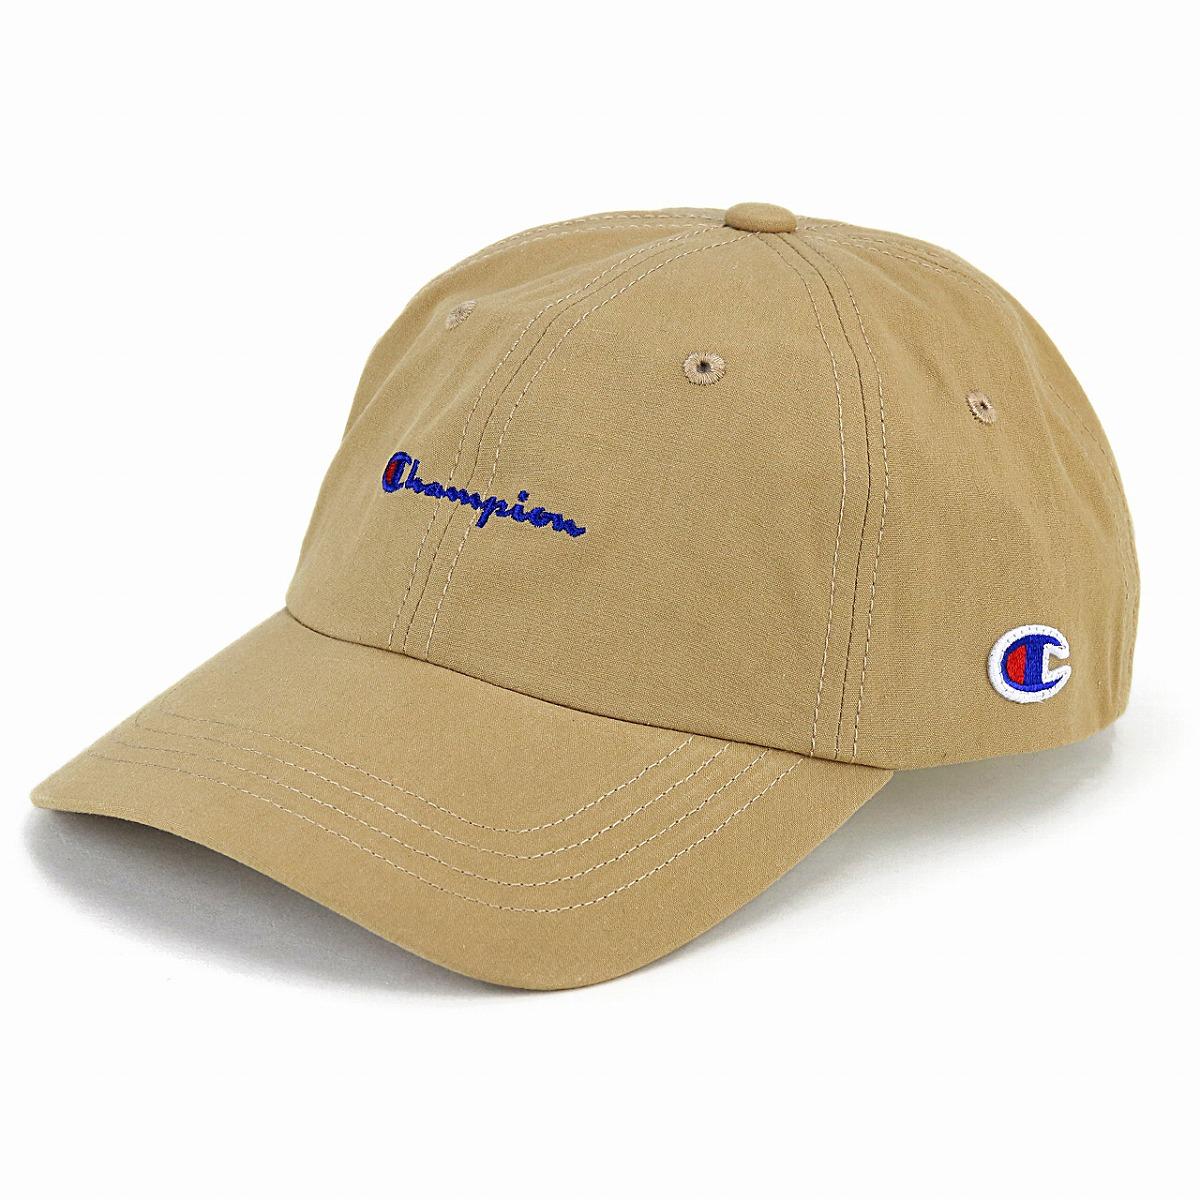 0b4ffb3f649 Champion cap men champion low cap Lady s logo cap Shin pull plain casual hat  sports cap unisex adjustable size   beige  baseball cap  birthday present  ...